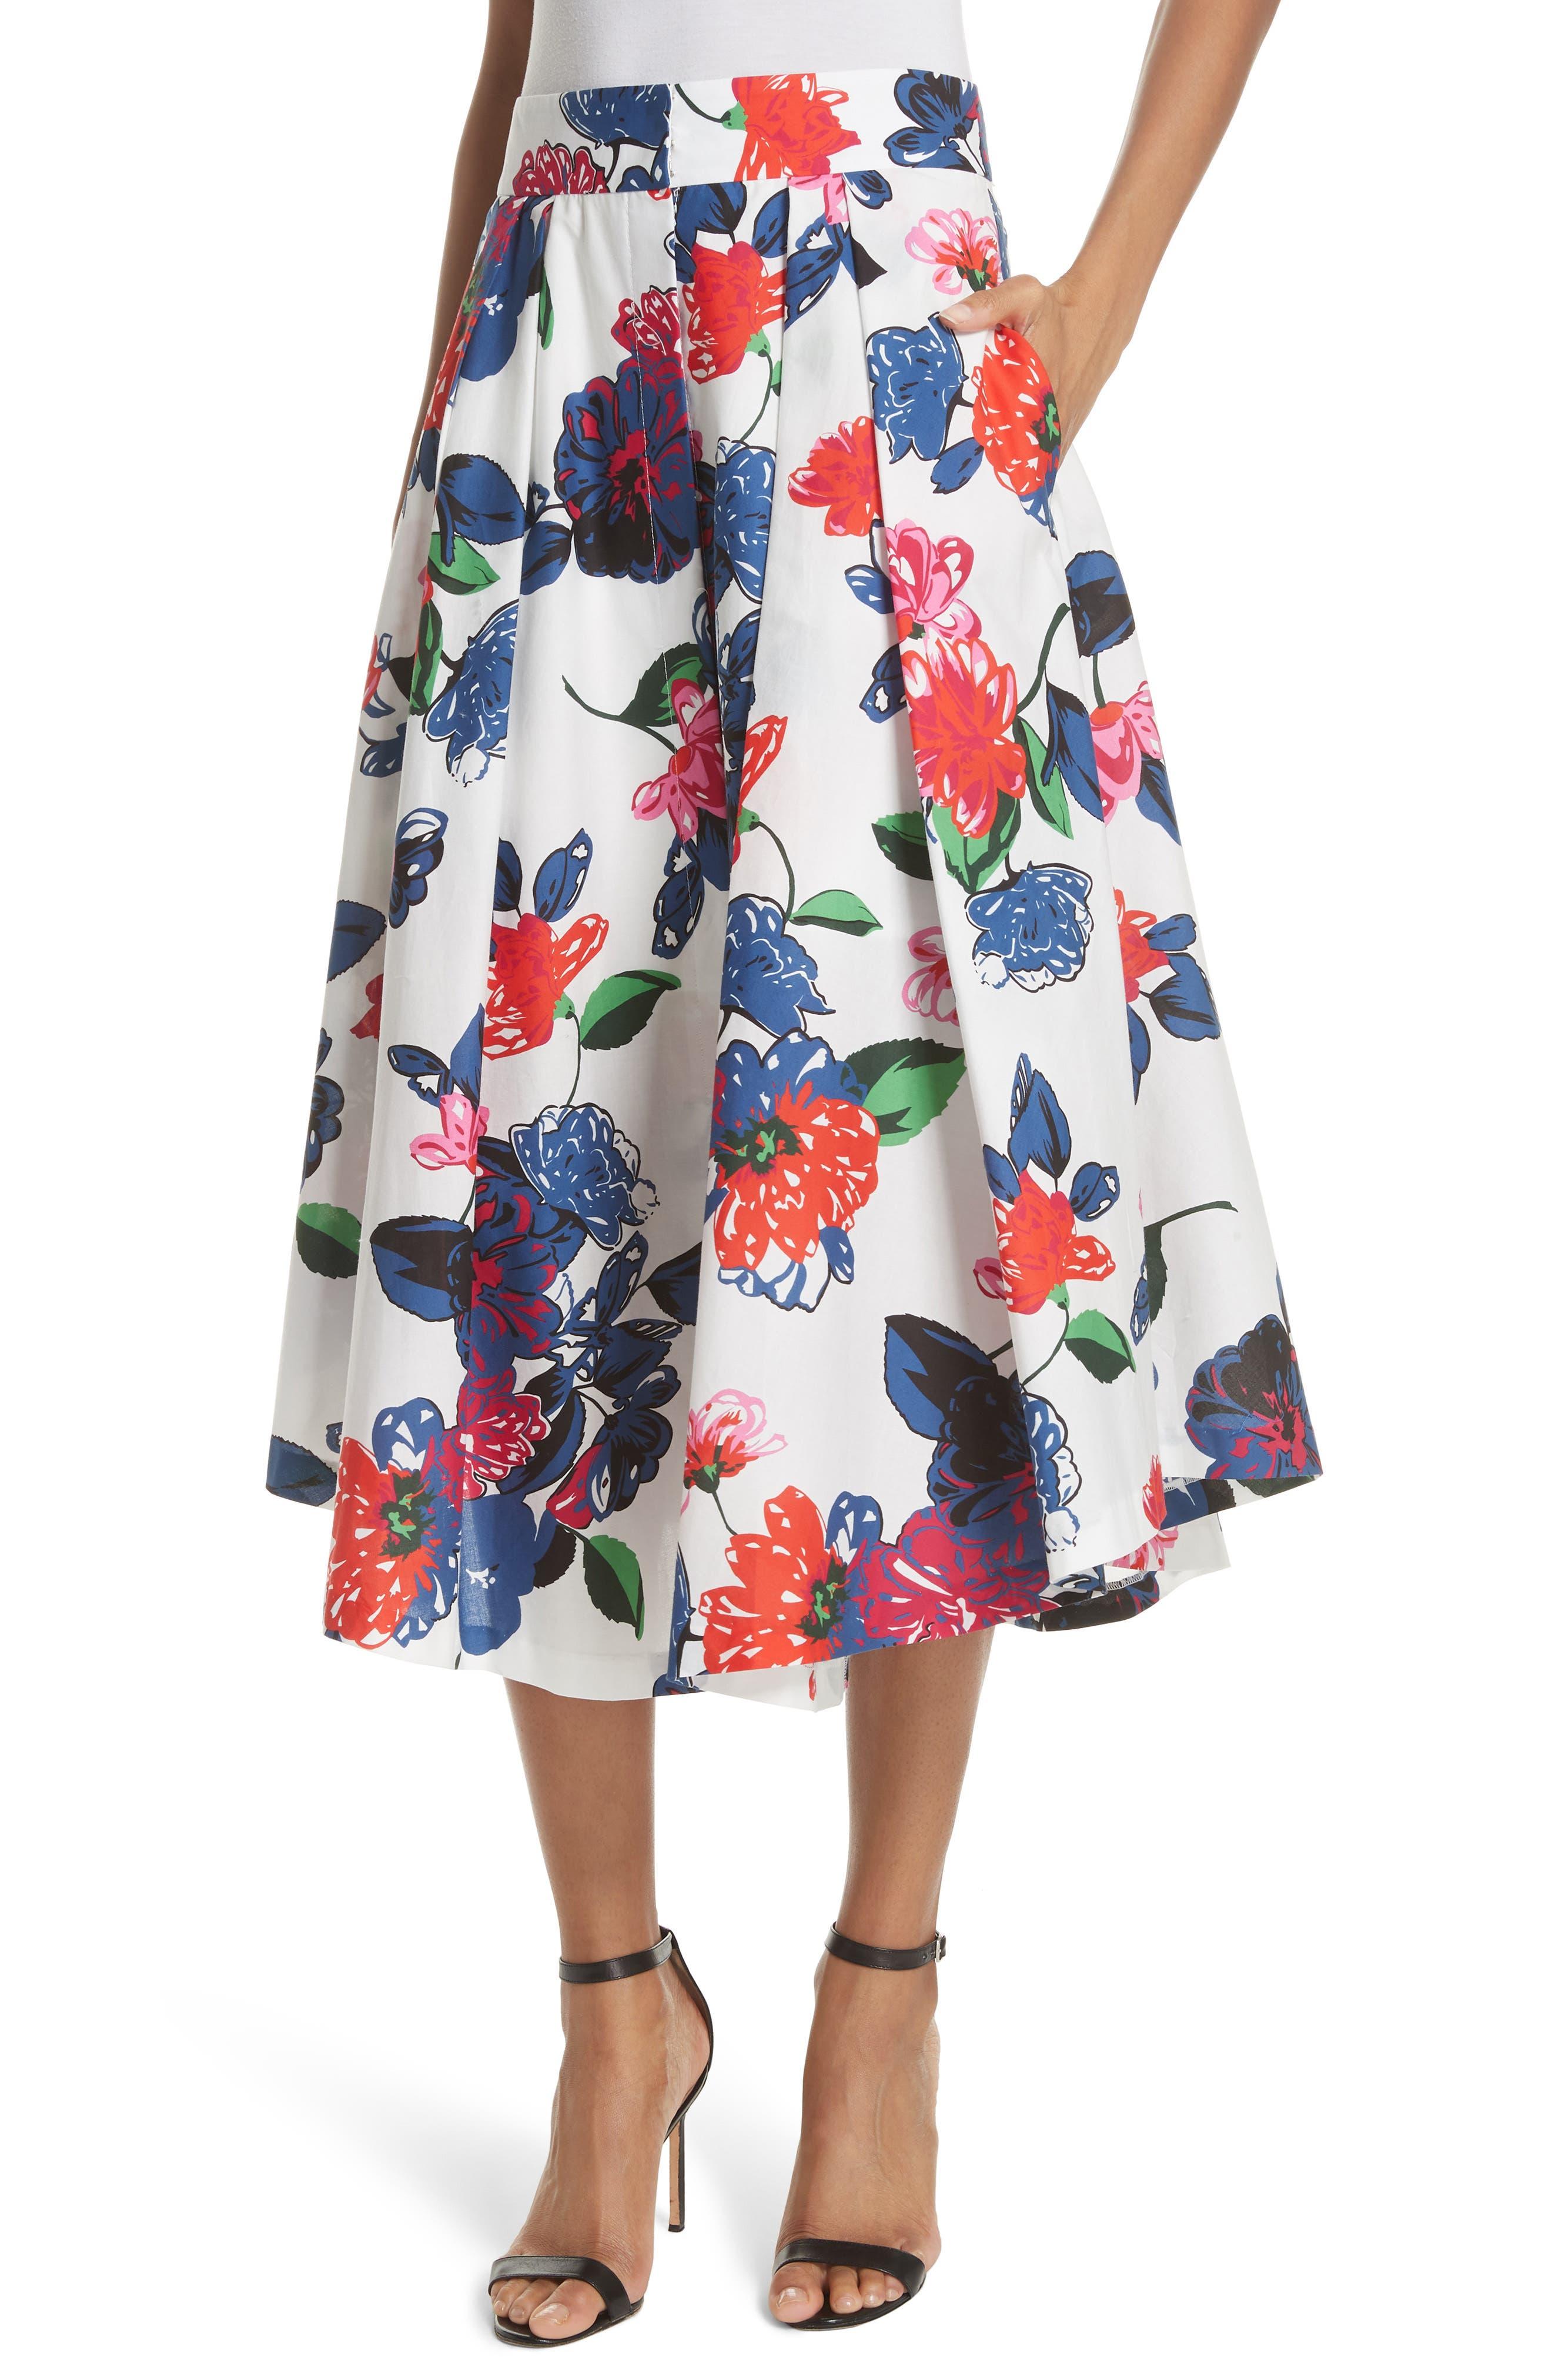 Floral Print Stretch Cotton Skirt,                             Main thumbnail 1, color,                             164